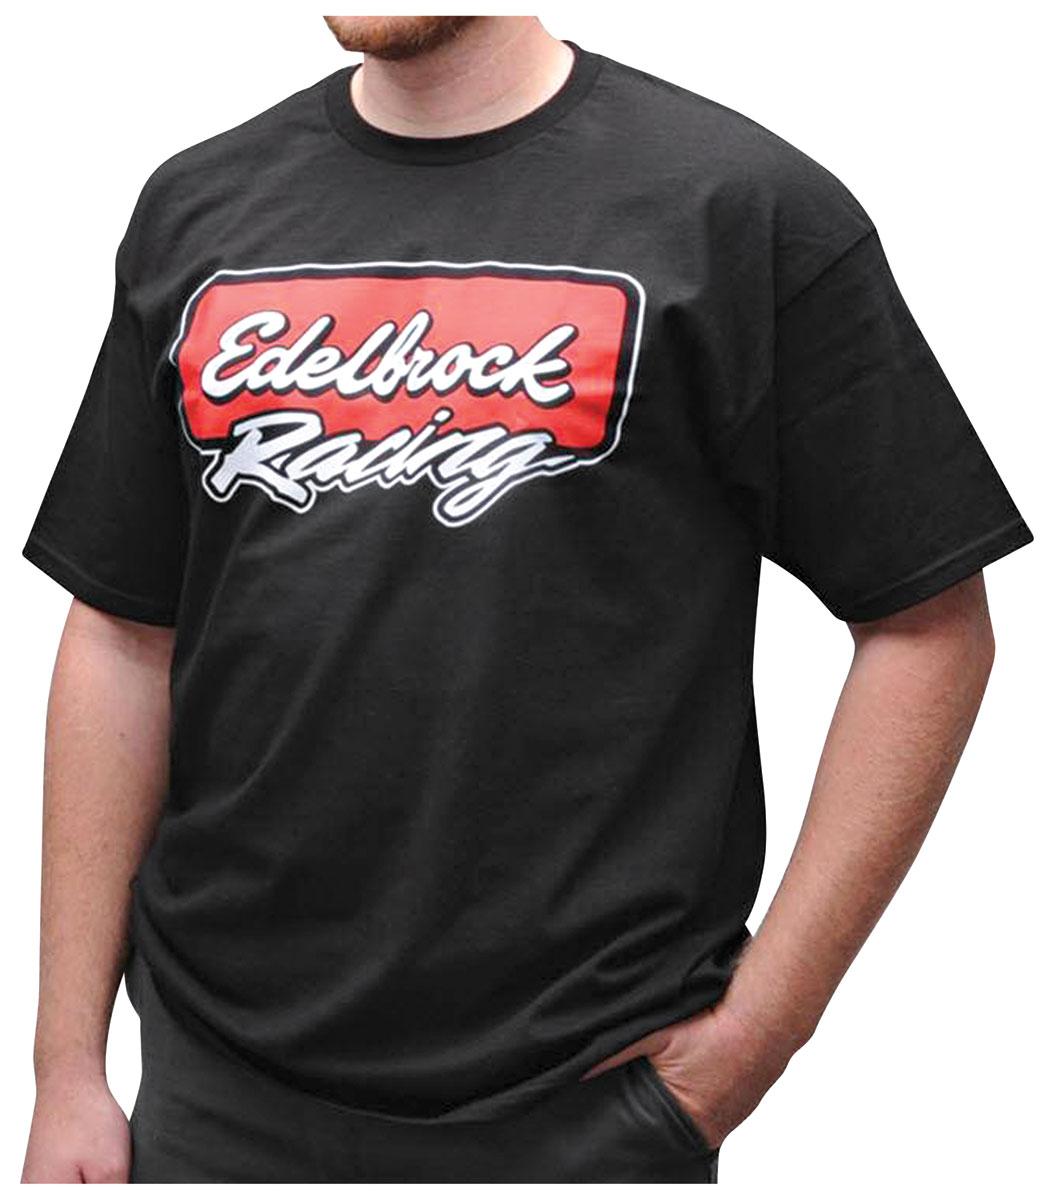 05ecbdba Edelbrock Racing T-Shirt black Fits 1964-77 Chevelle @ OPGI.com